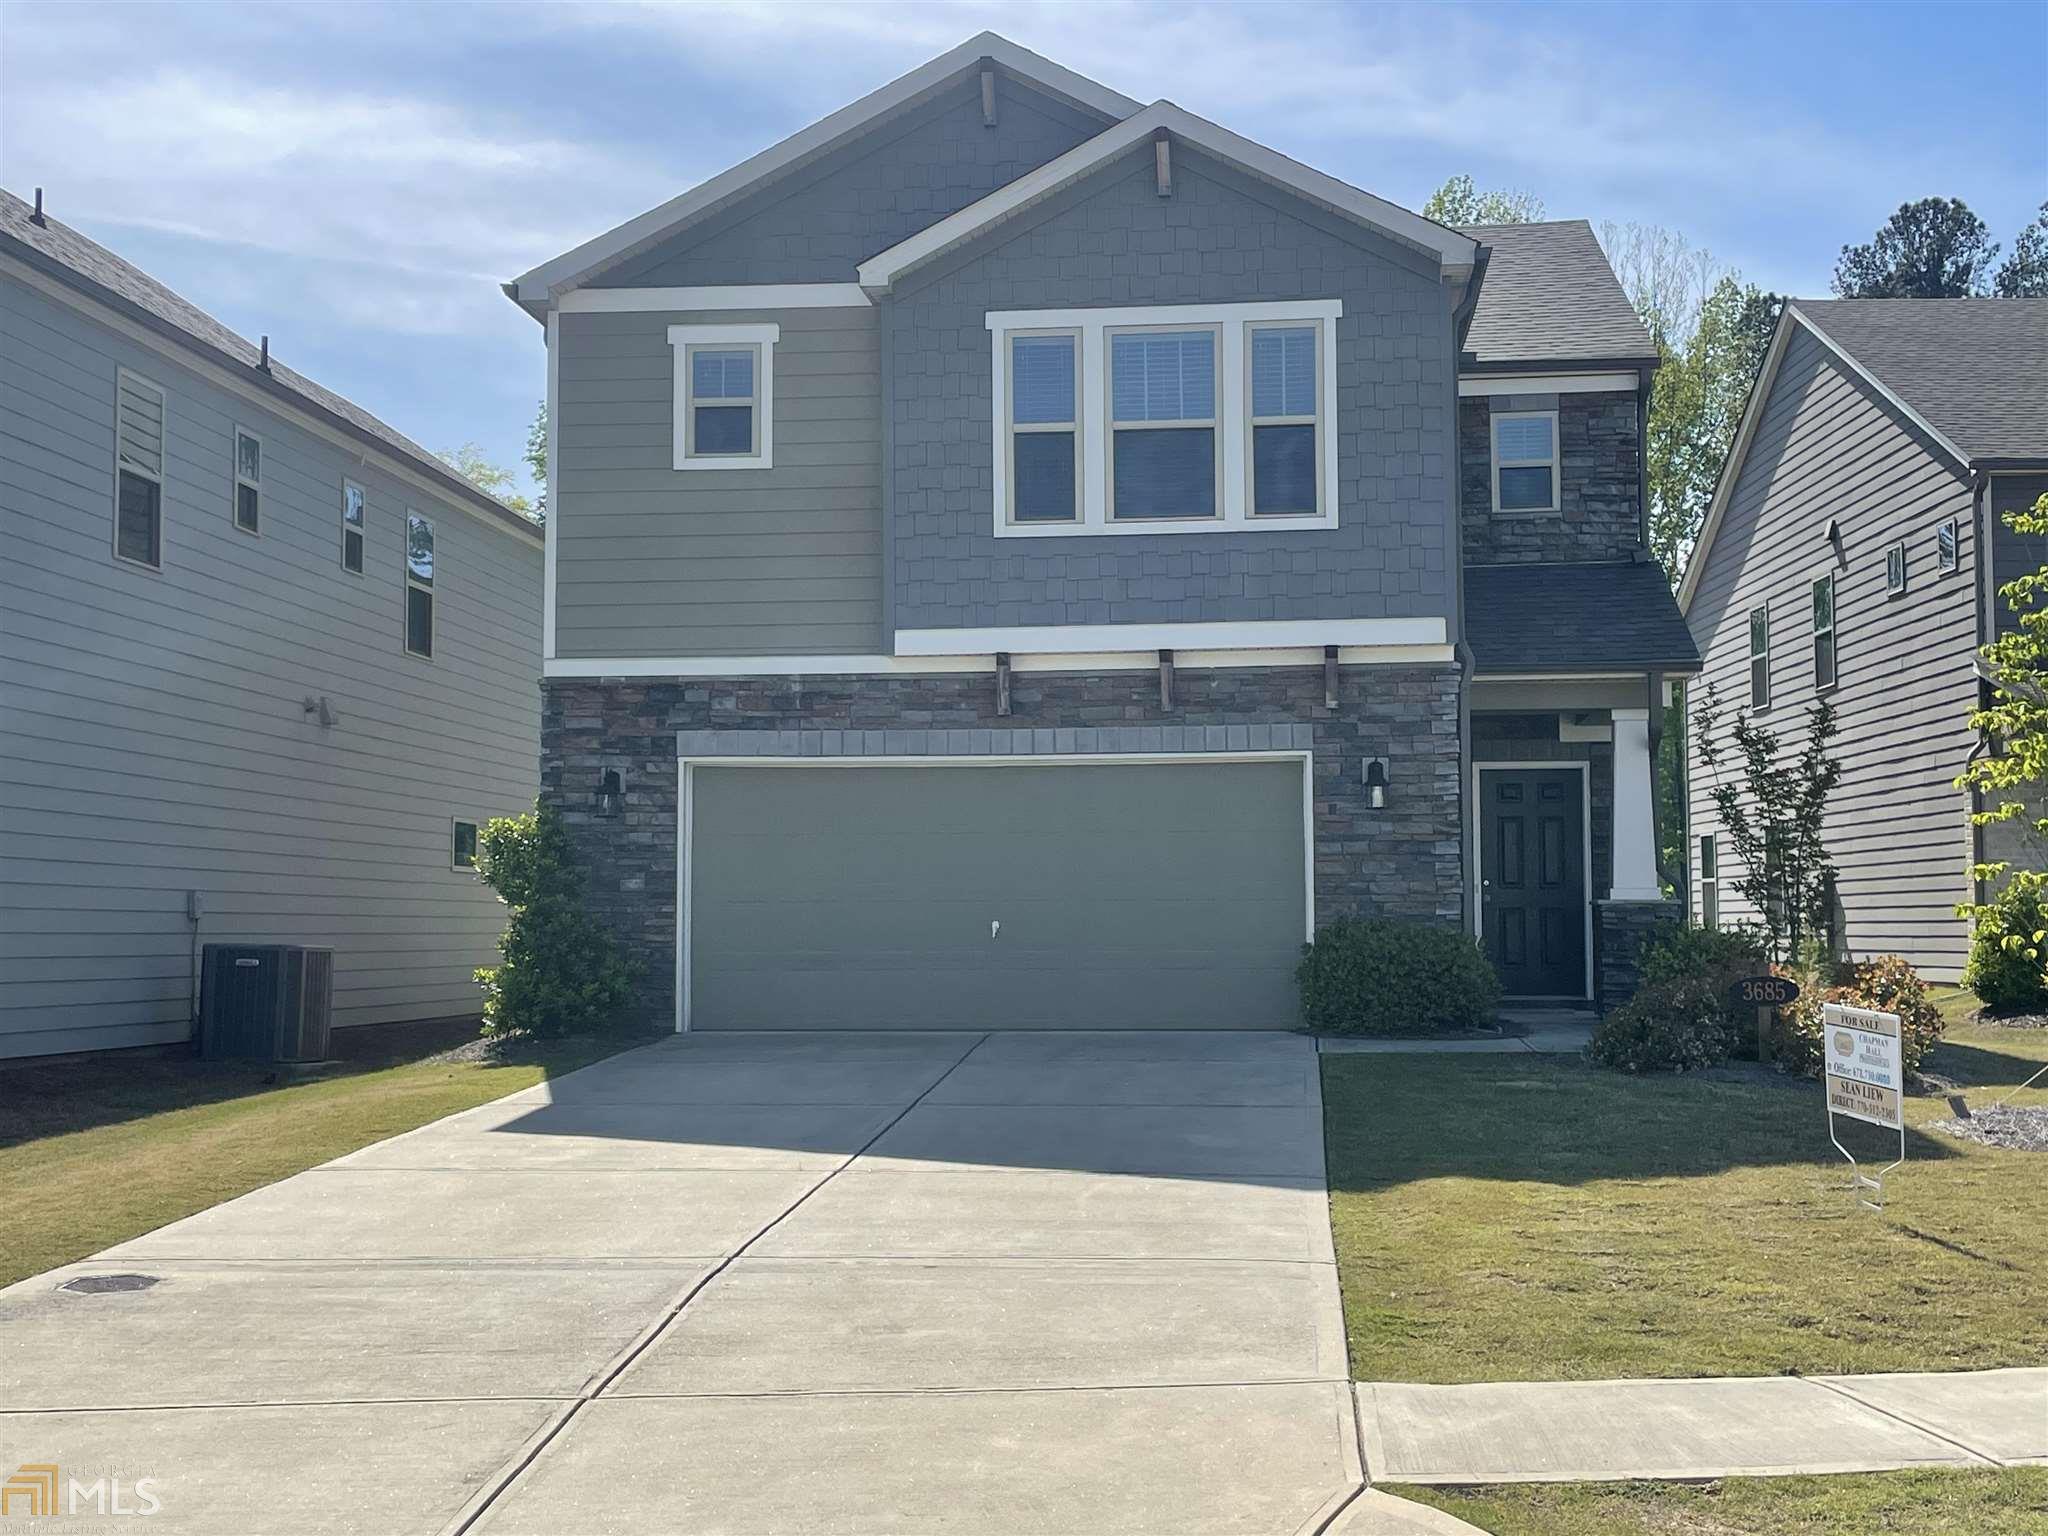 3685 Morgan Rd, Buford, Georgia 30519, 4 Bedrooms Bedrooms, ,3 BathroomsBathrooms,Single Family,For Sale,3685 Morgan Rd,2,8970805